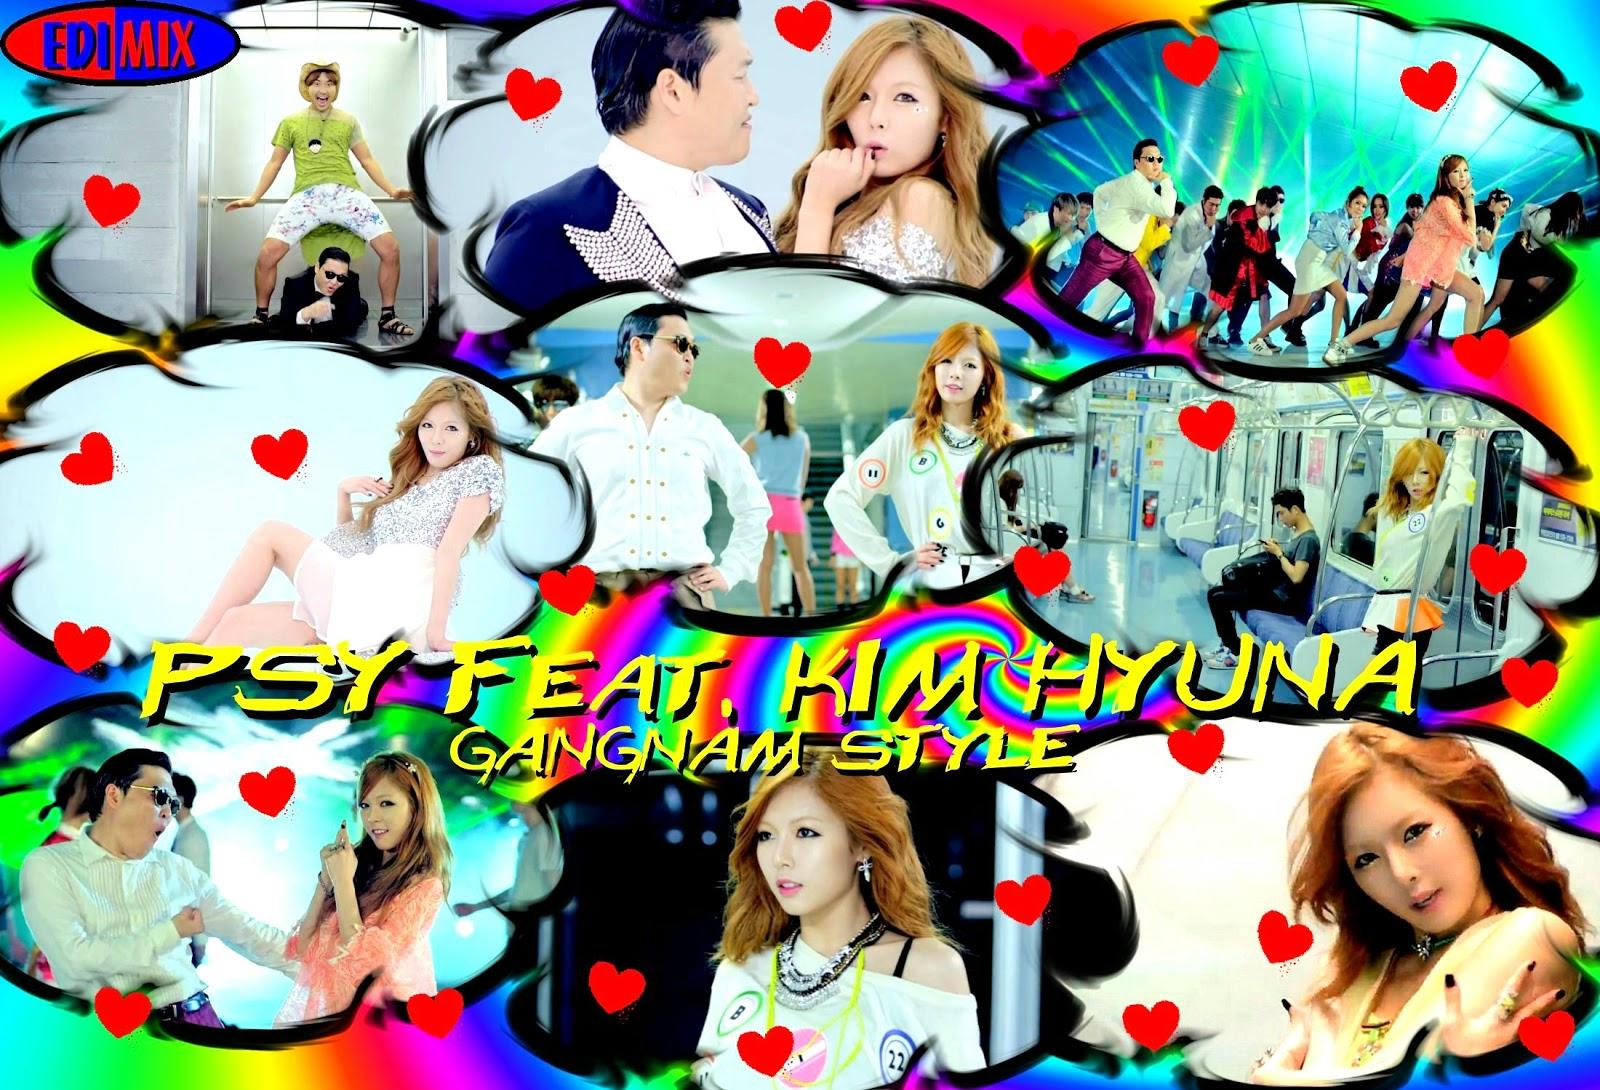 http://1.bp.blogspot.com/-_-k2BS0DnVk/UIwghikBn0I/AAAAAAAAA6w/5JZwYbNNBx4/s1600/PSY+Feat.+KIM+HYUNA+-+Gangnam+Style+(1).JPG